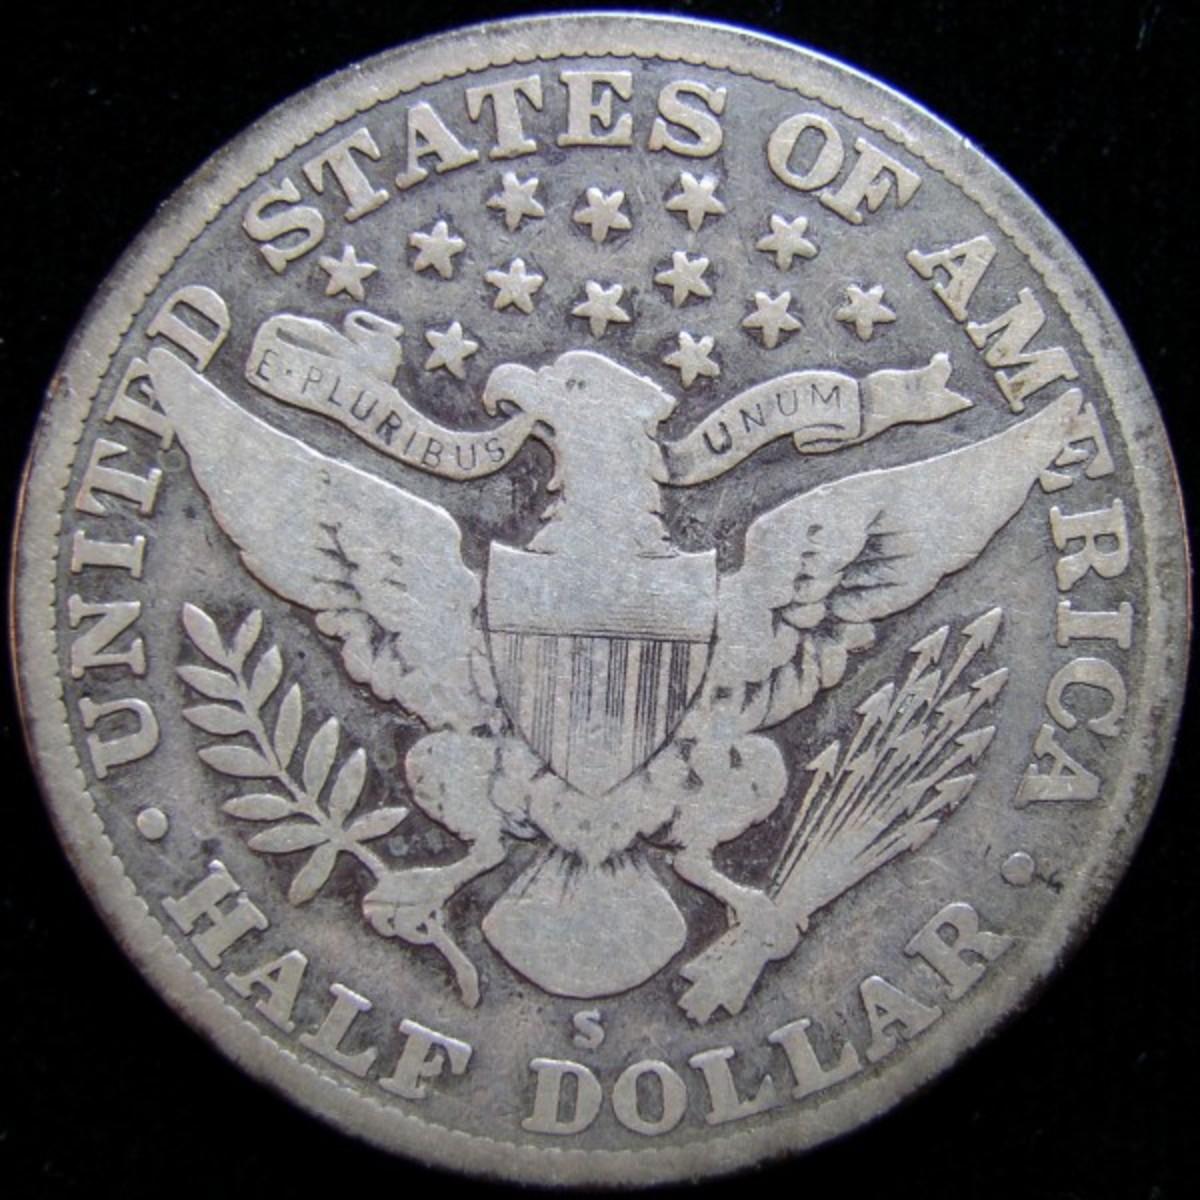 Above Photos: Circulated Barber Half Dollar showing San Francisco Mintmark. Photo Courtesy: coinpage.com